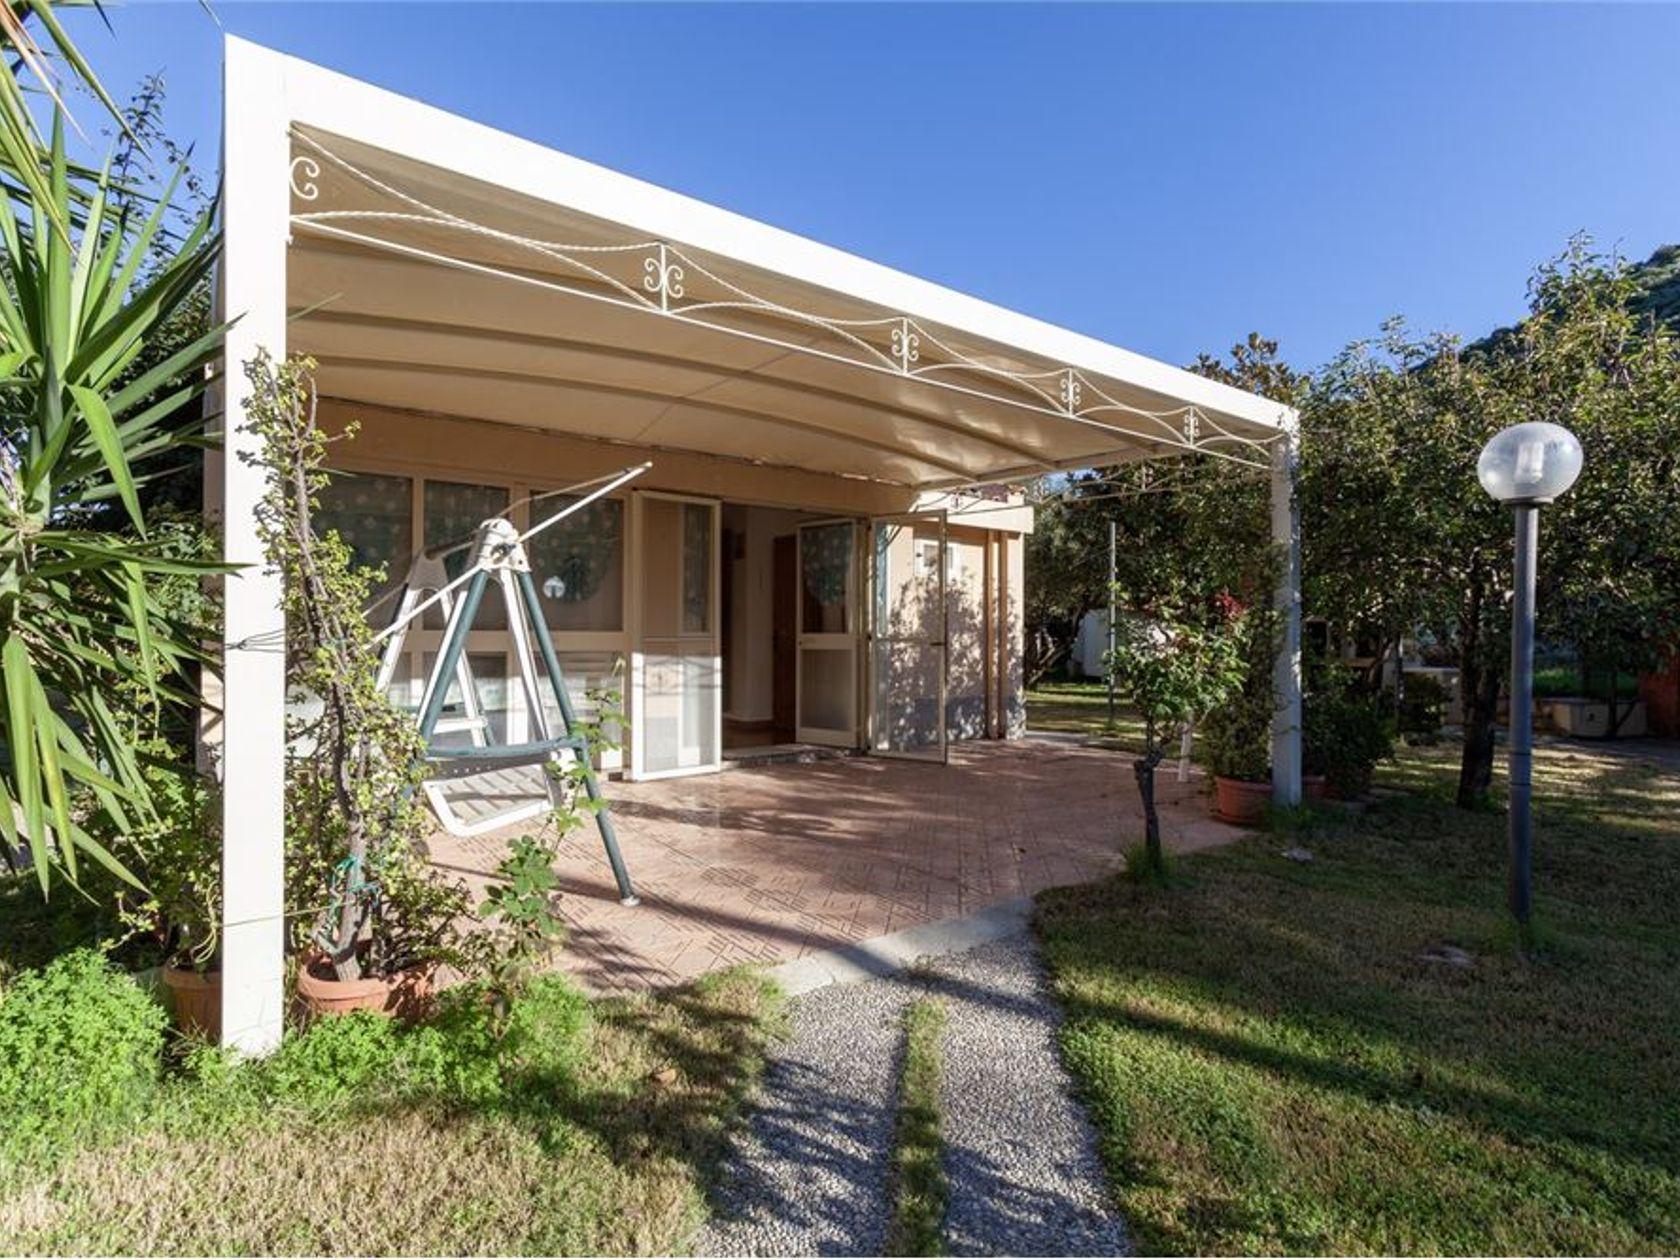 Villa singola Geremeas, Maracalagonis, CA Vendita - Foto 9